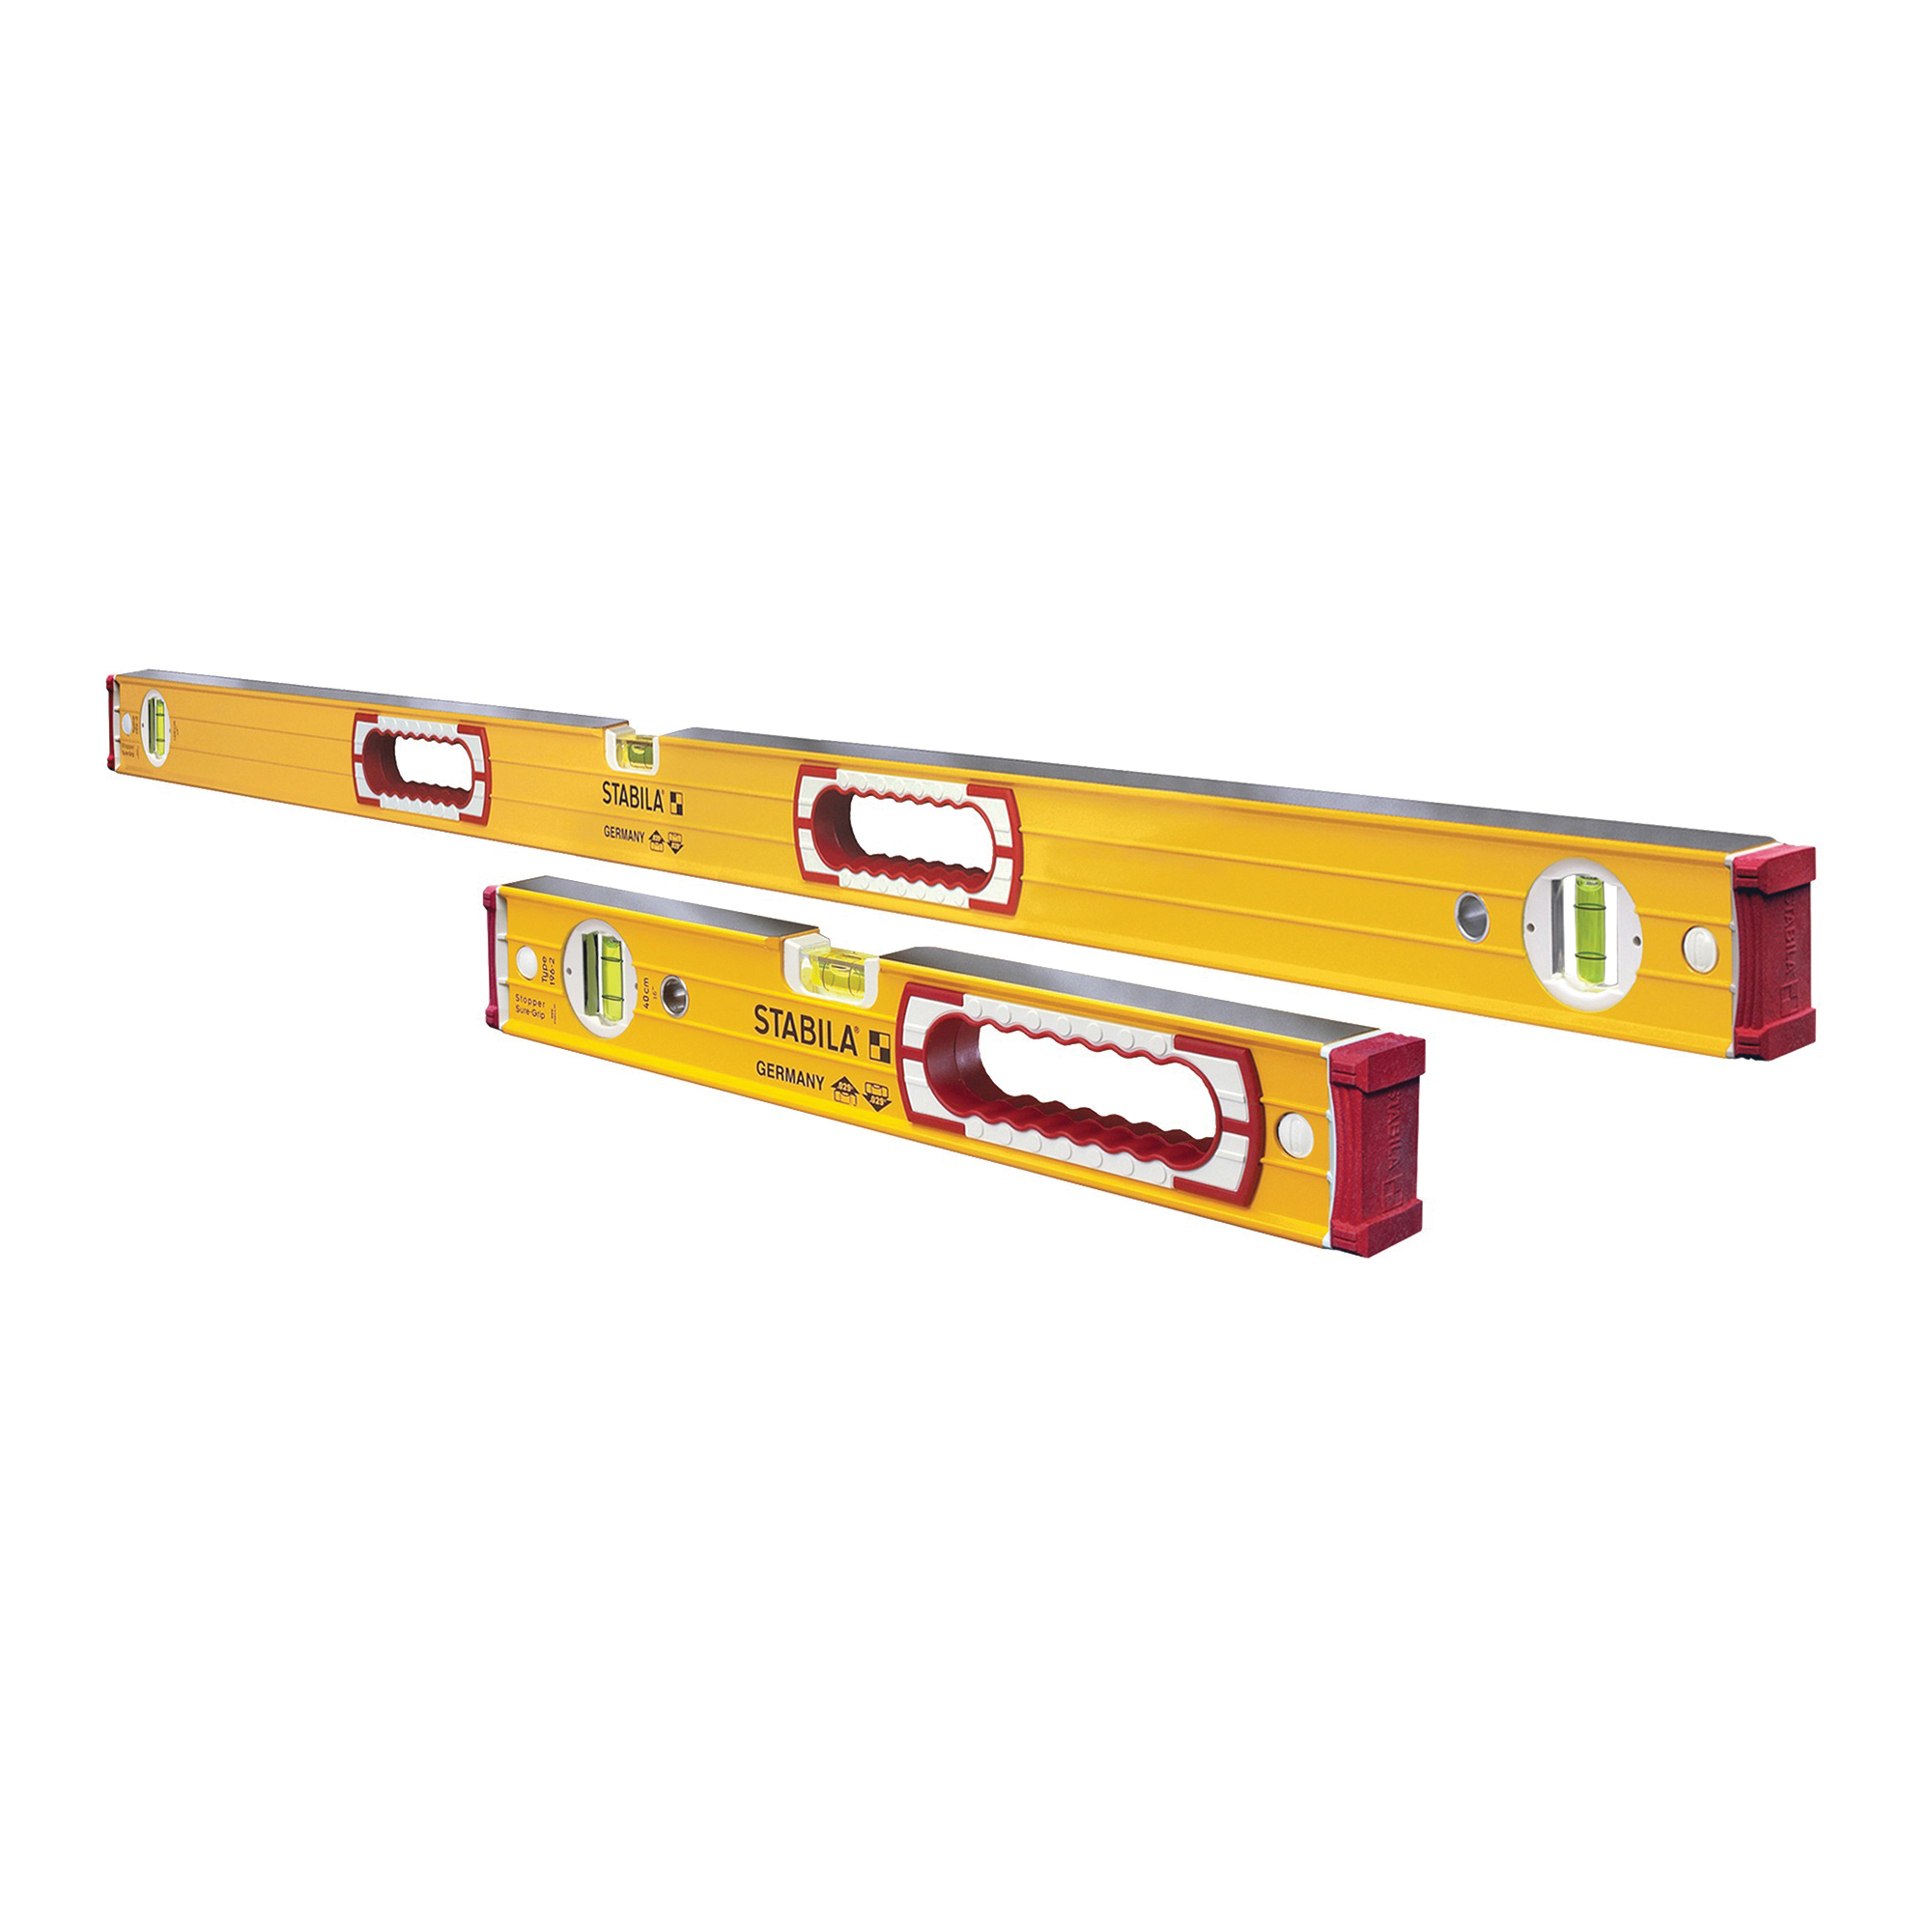 Picture of Stabila 37816 Beam Level Set, 5 -Vial, Aluminum, Yellow